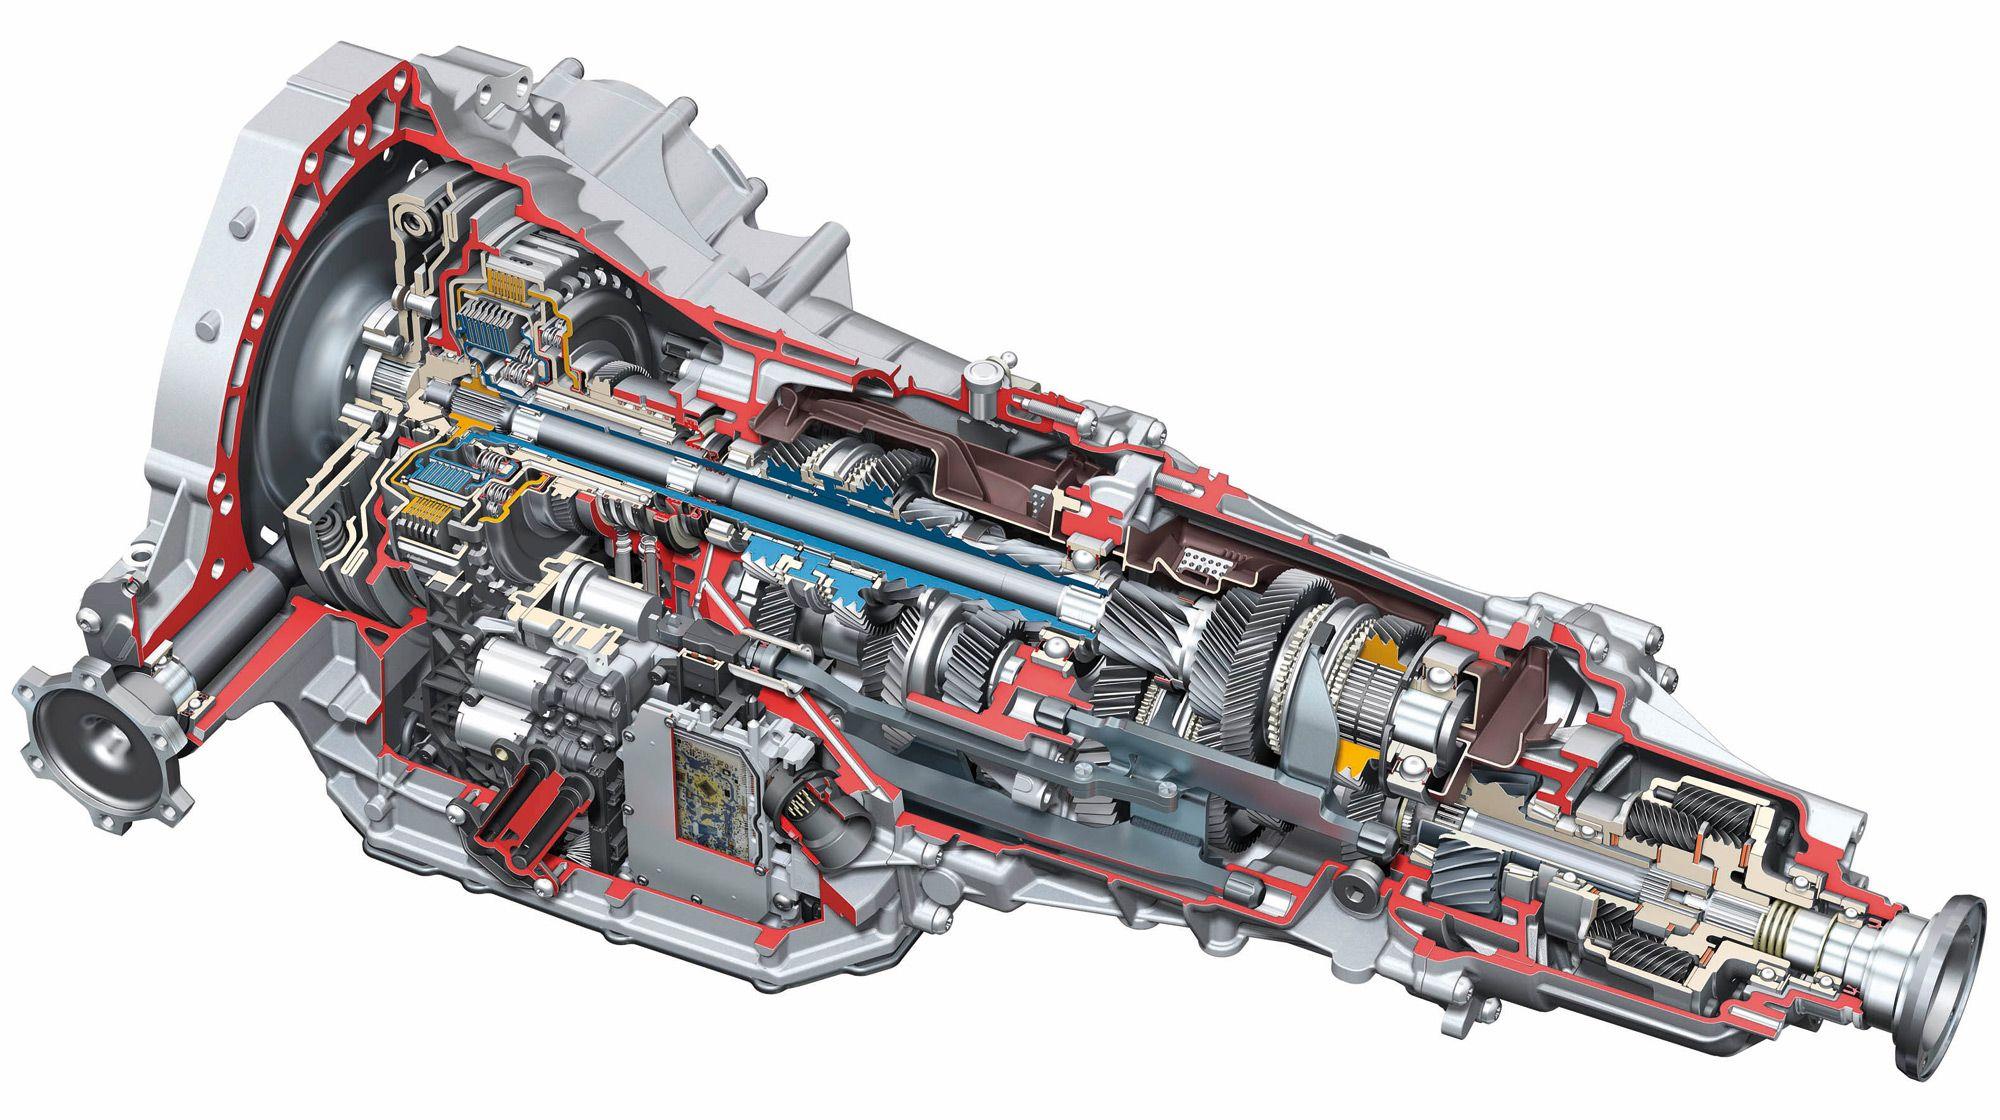 2002 Chevrolet Avalanche 2500 Transmission Assembly 1,099